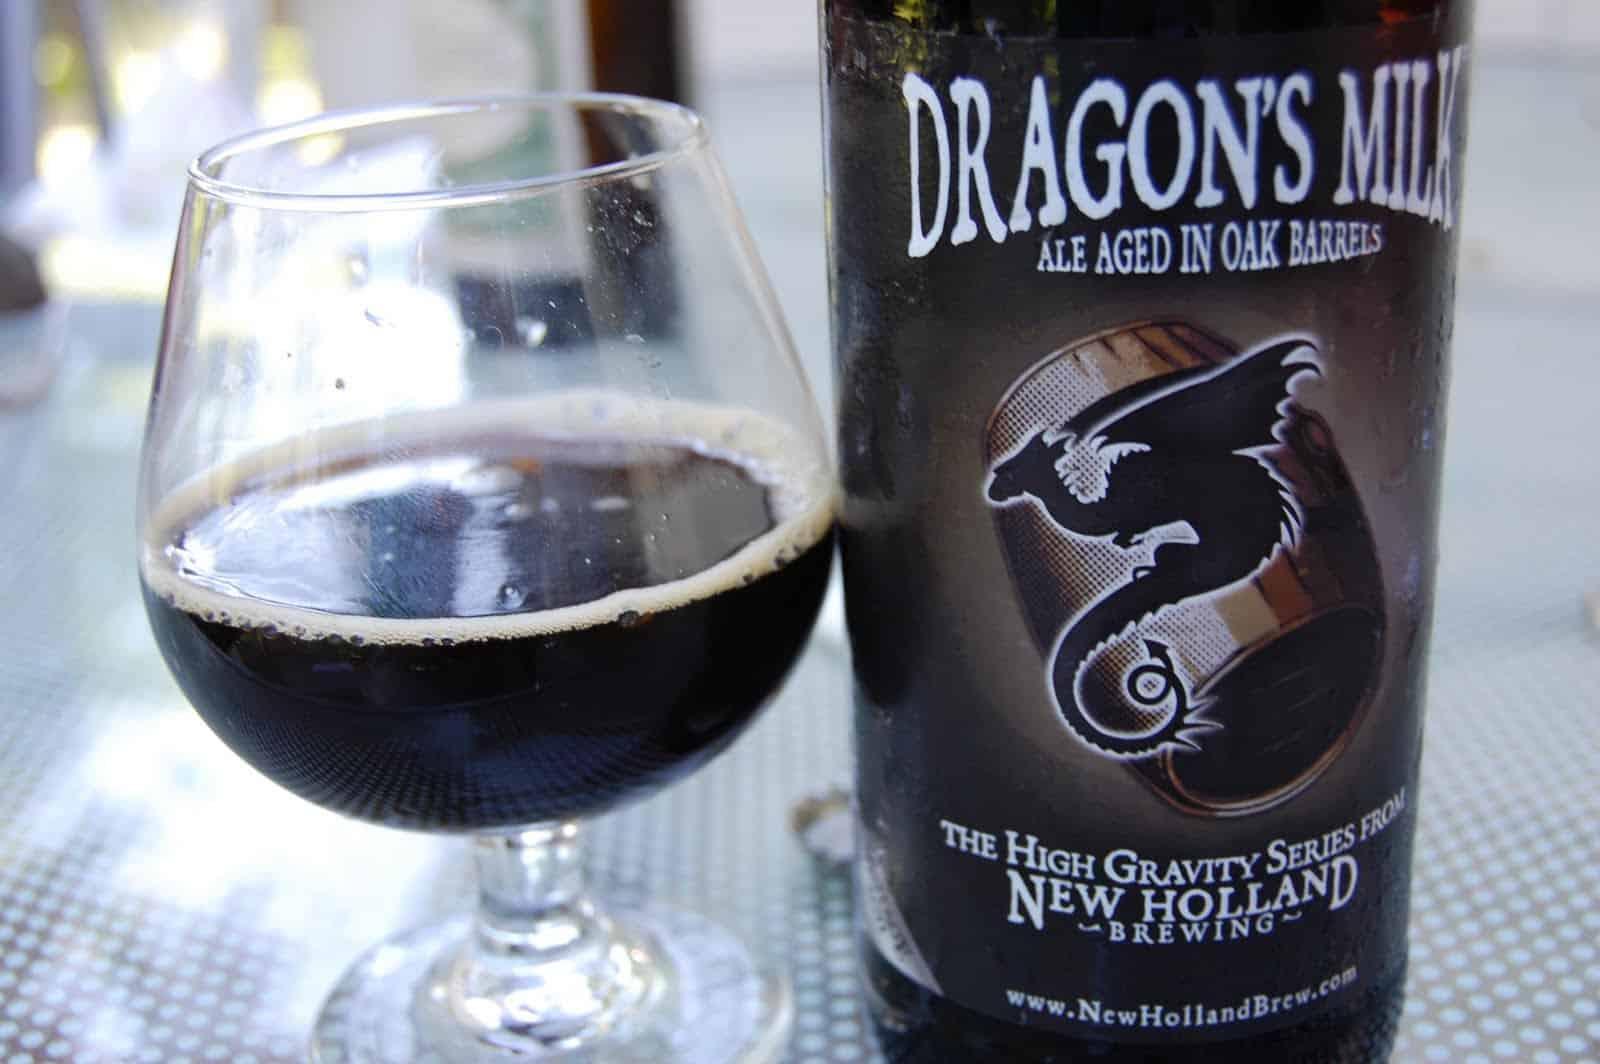 New Holland Dragon's Milk – best tasting beer